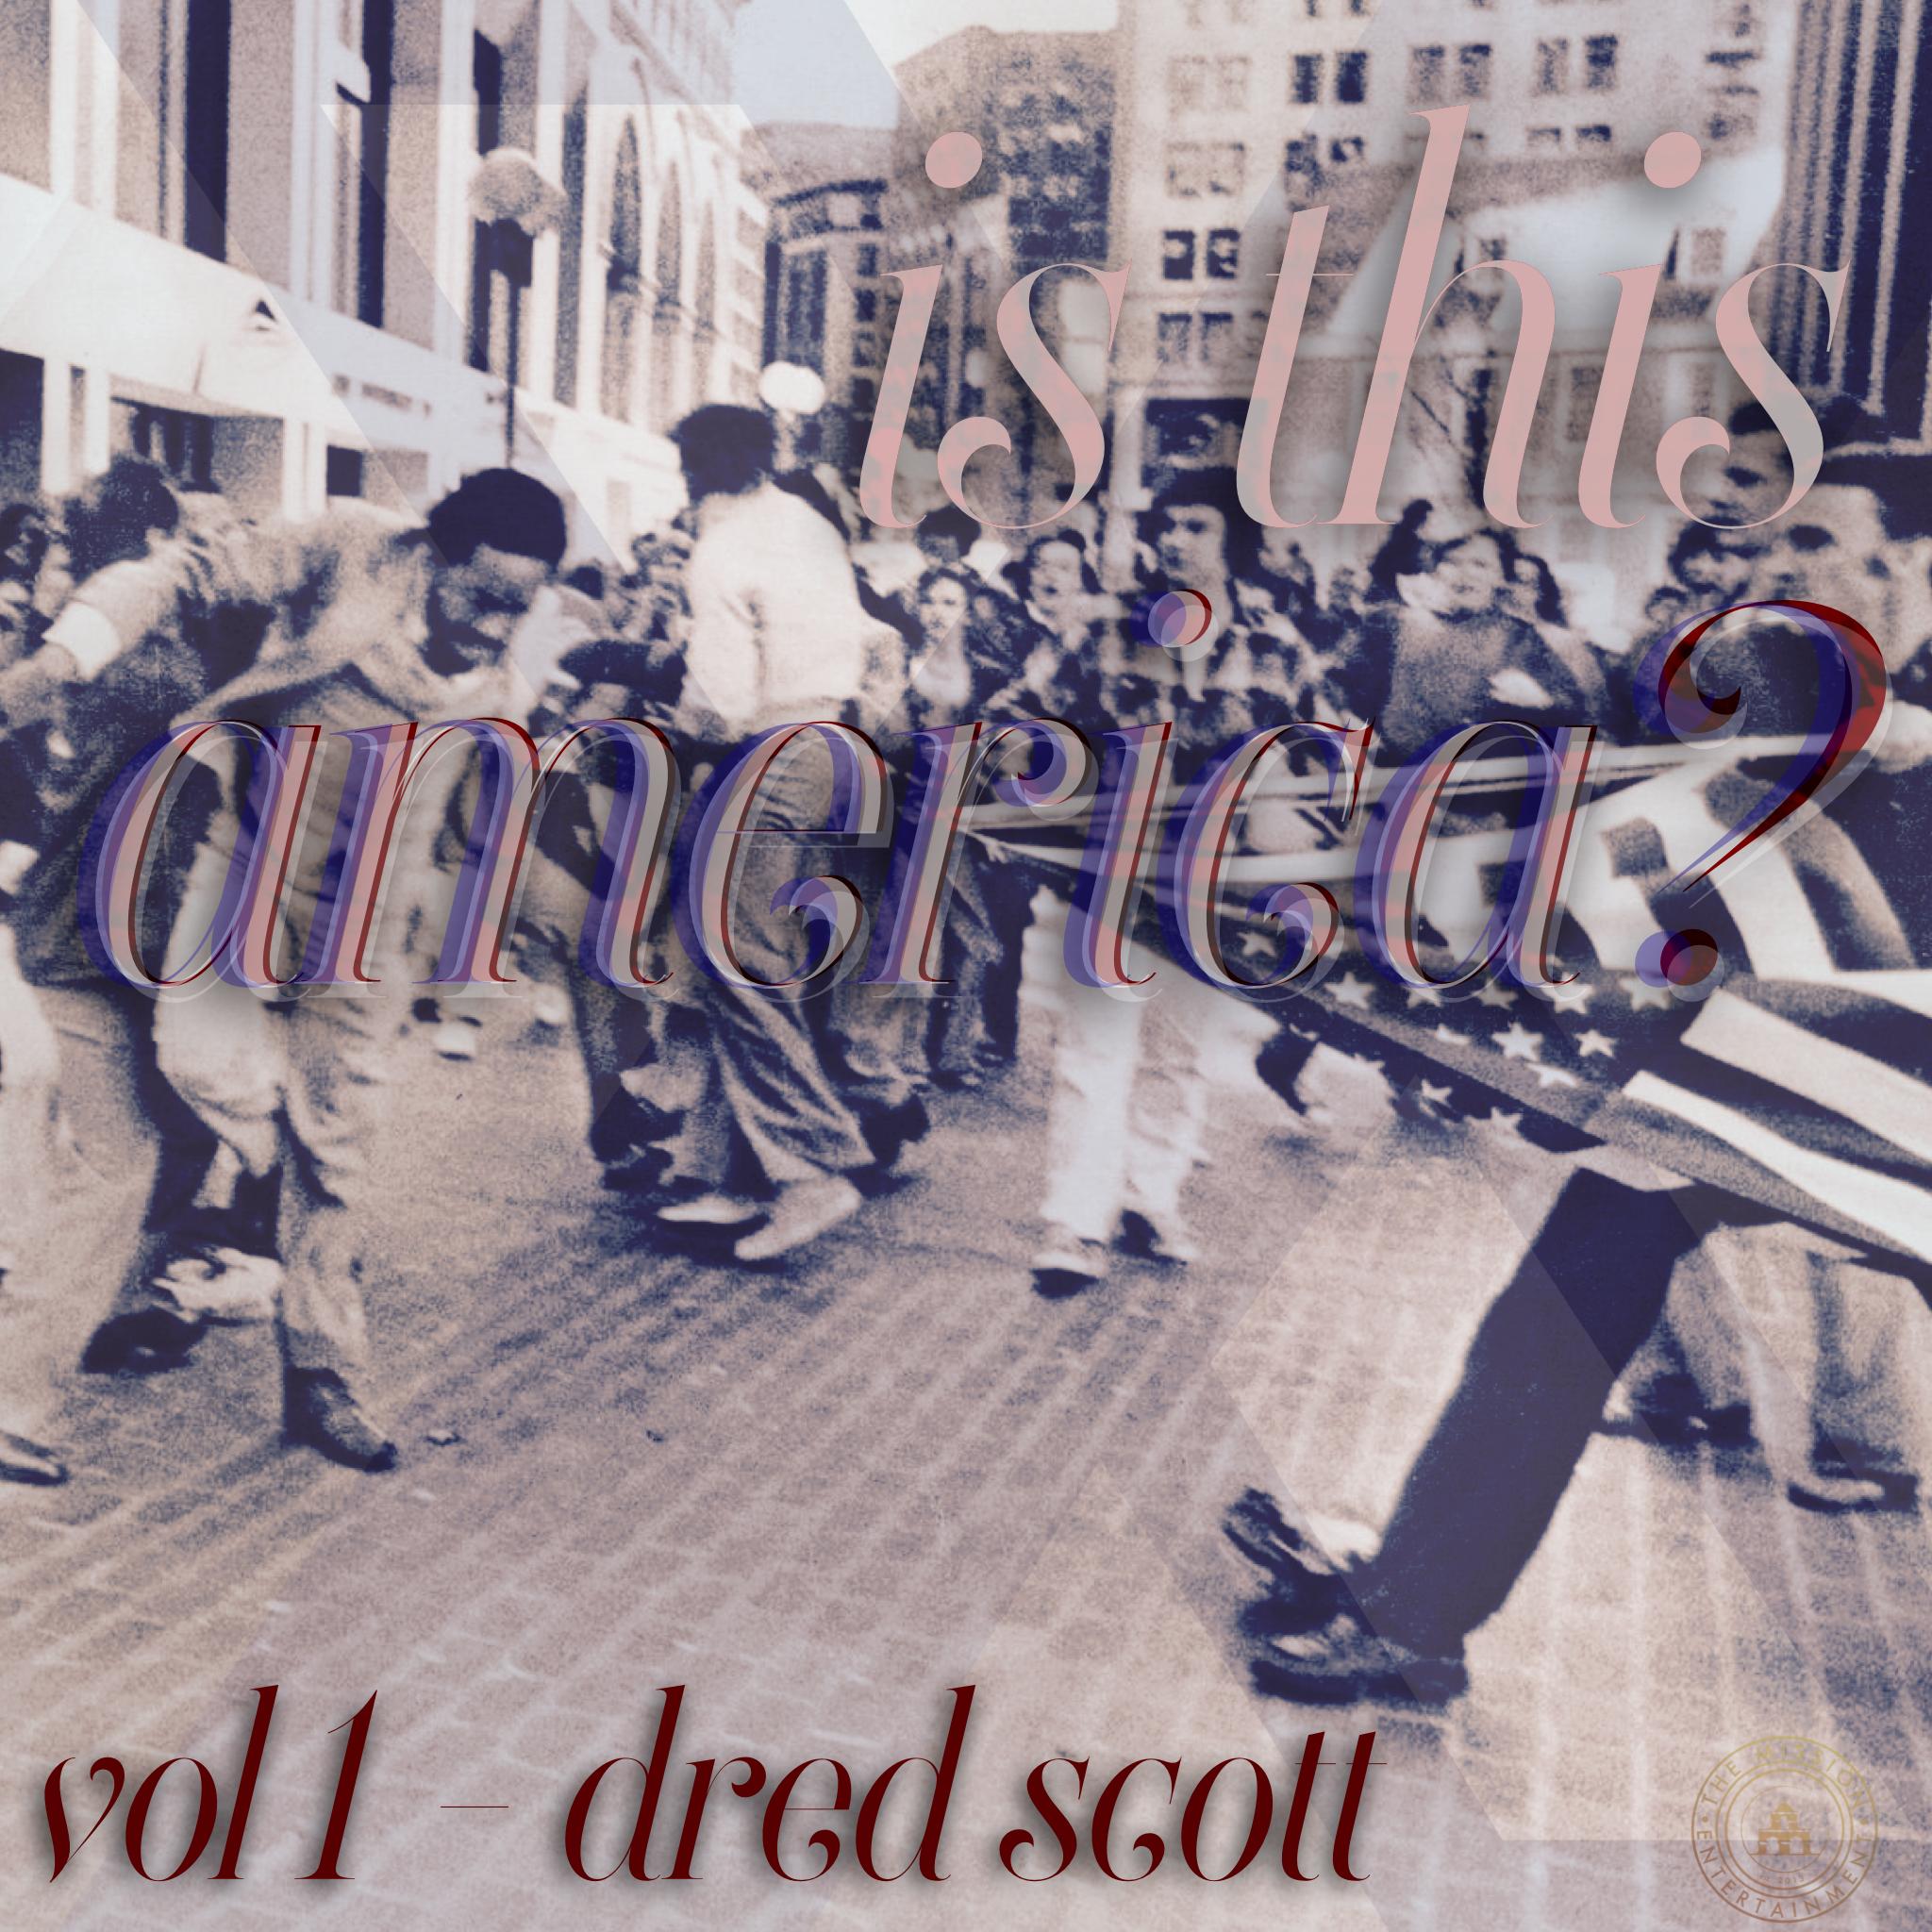 dred scott - ita v2.png